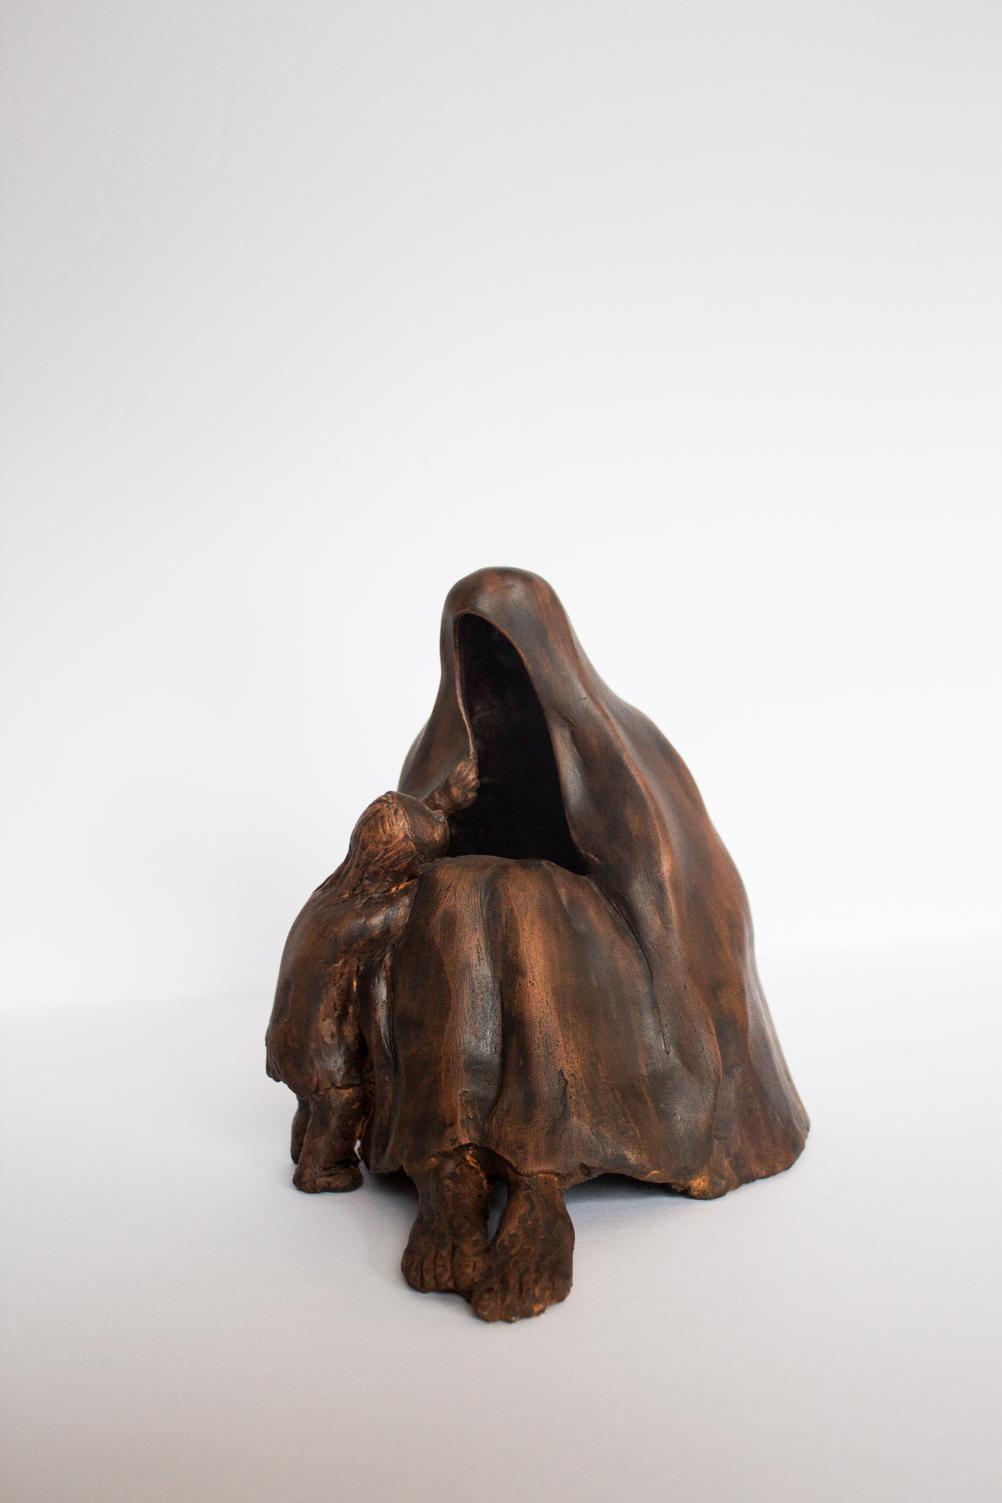 Woman Figure 15.17.15 cm bronze